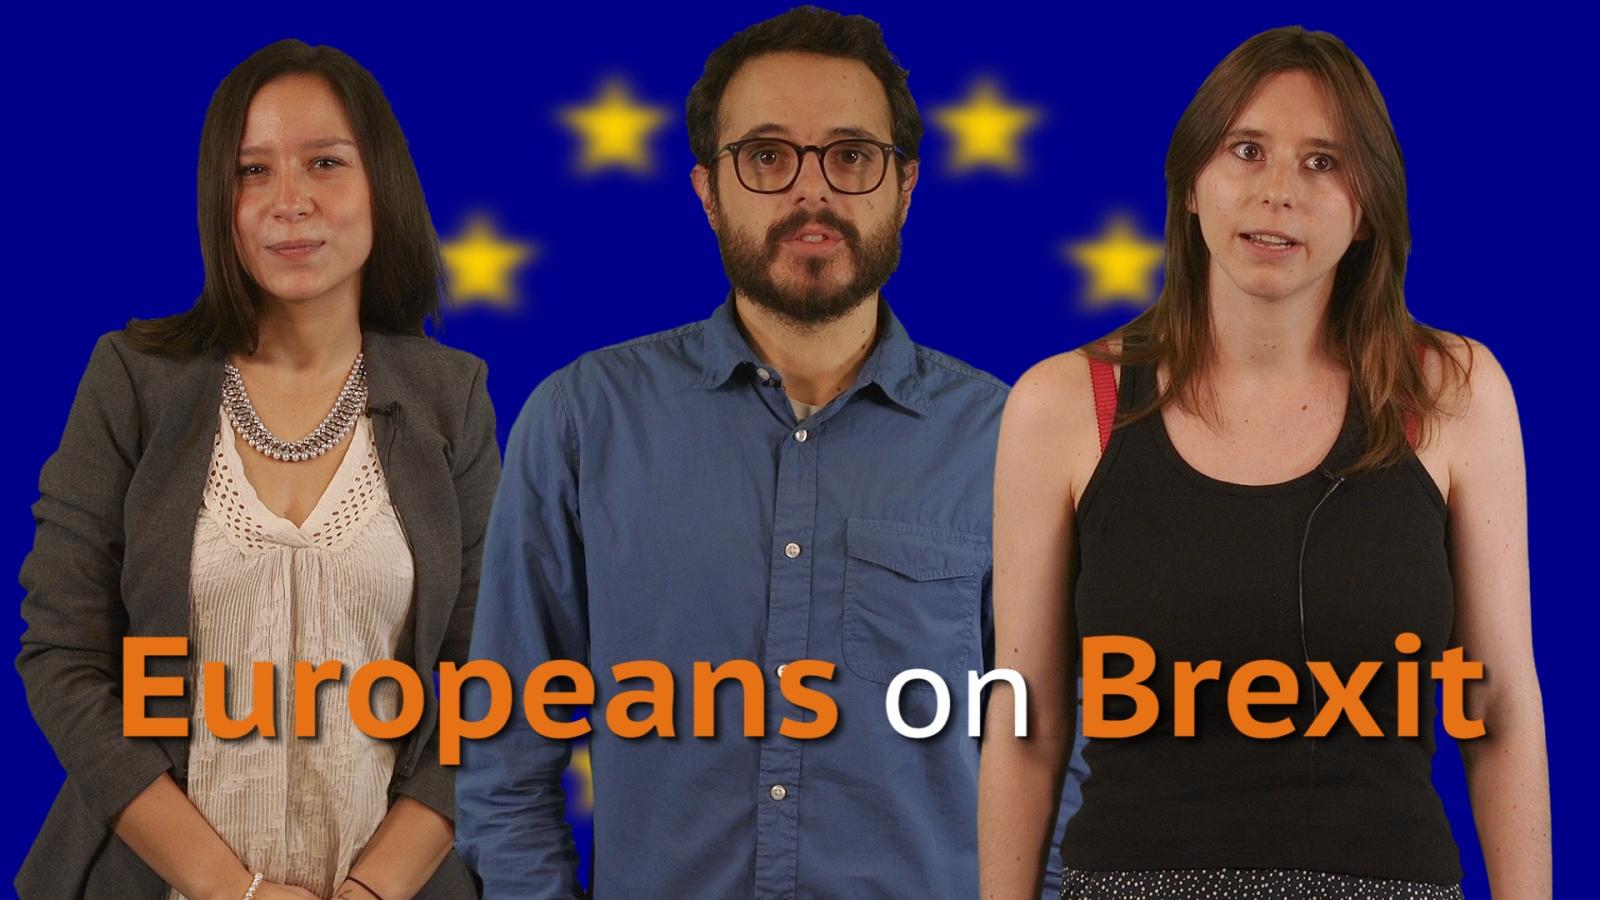 Europeans react to Britain's Brexit vote